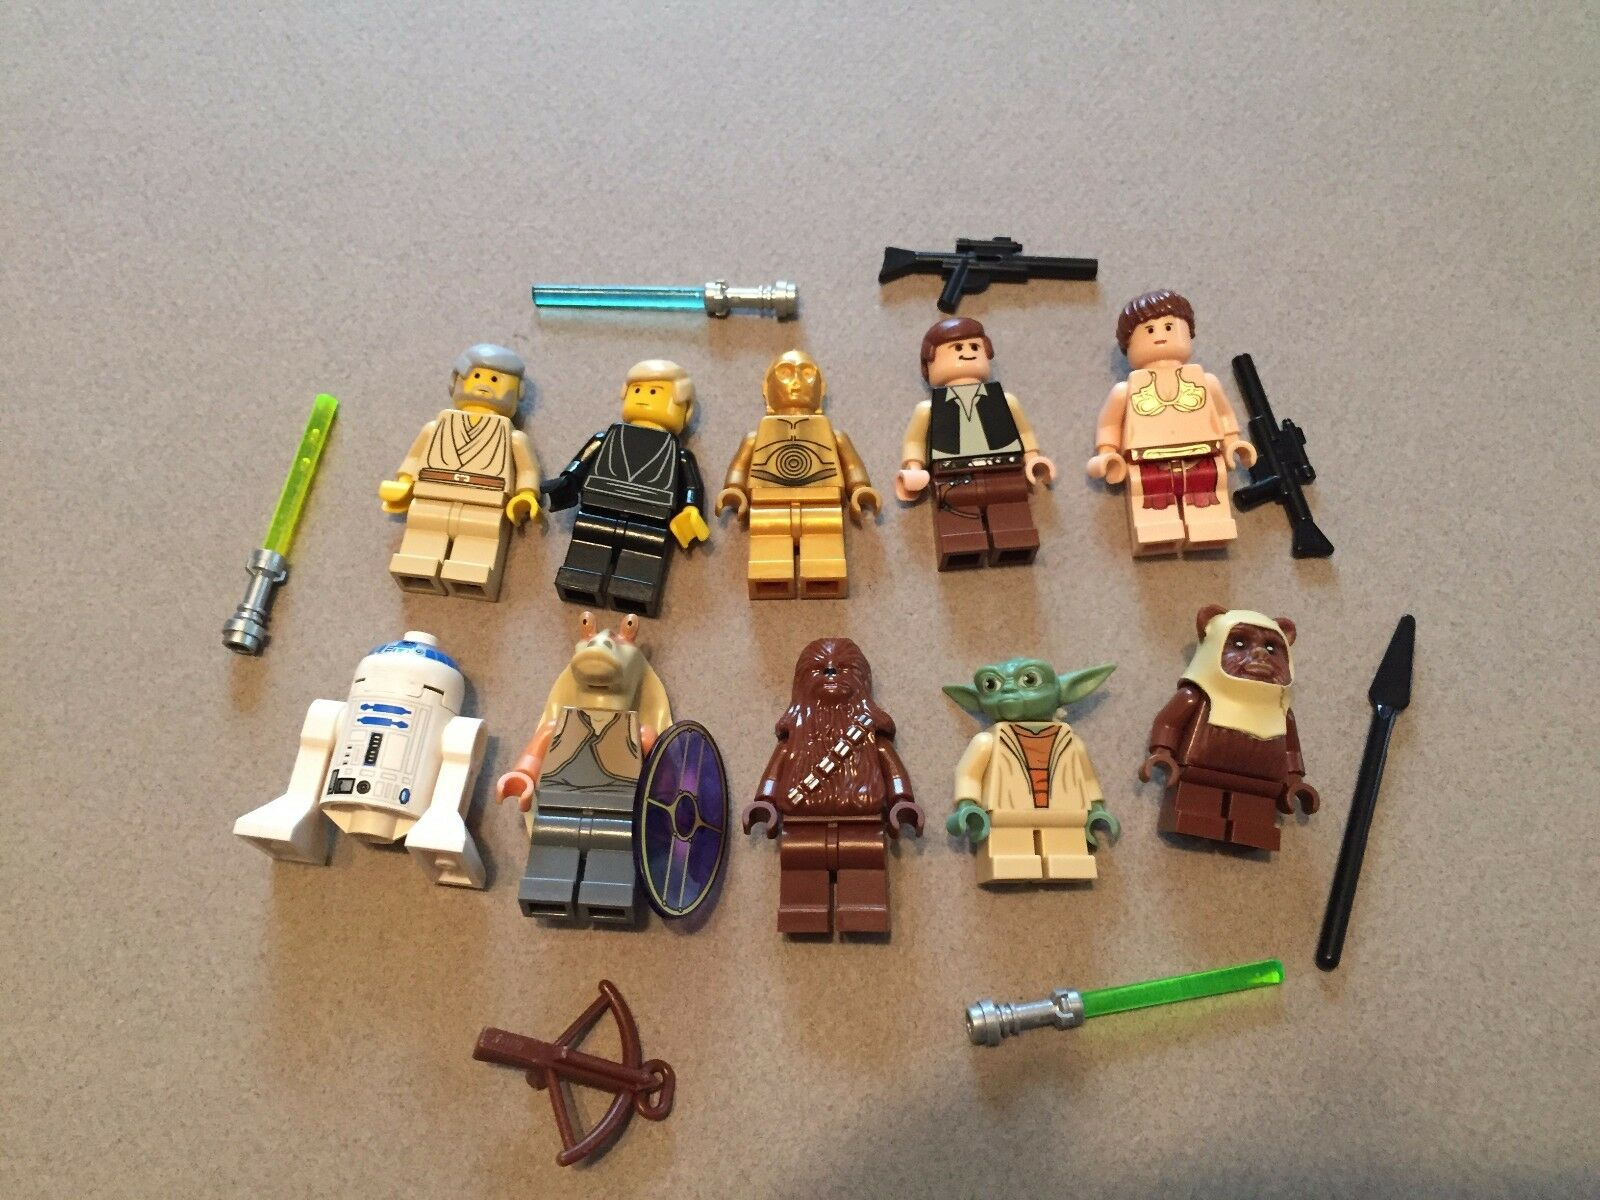 LEGO lot of 10 Star Wars Good Good Good Guy Minifigs Yoda Luke Leia Han R2-D2 Chewie Z311 cc92b0